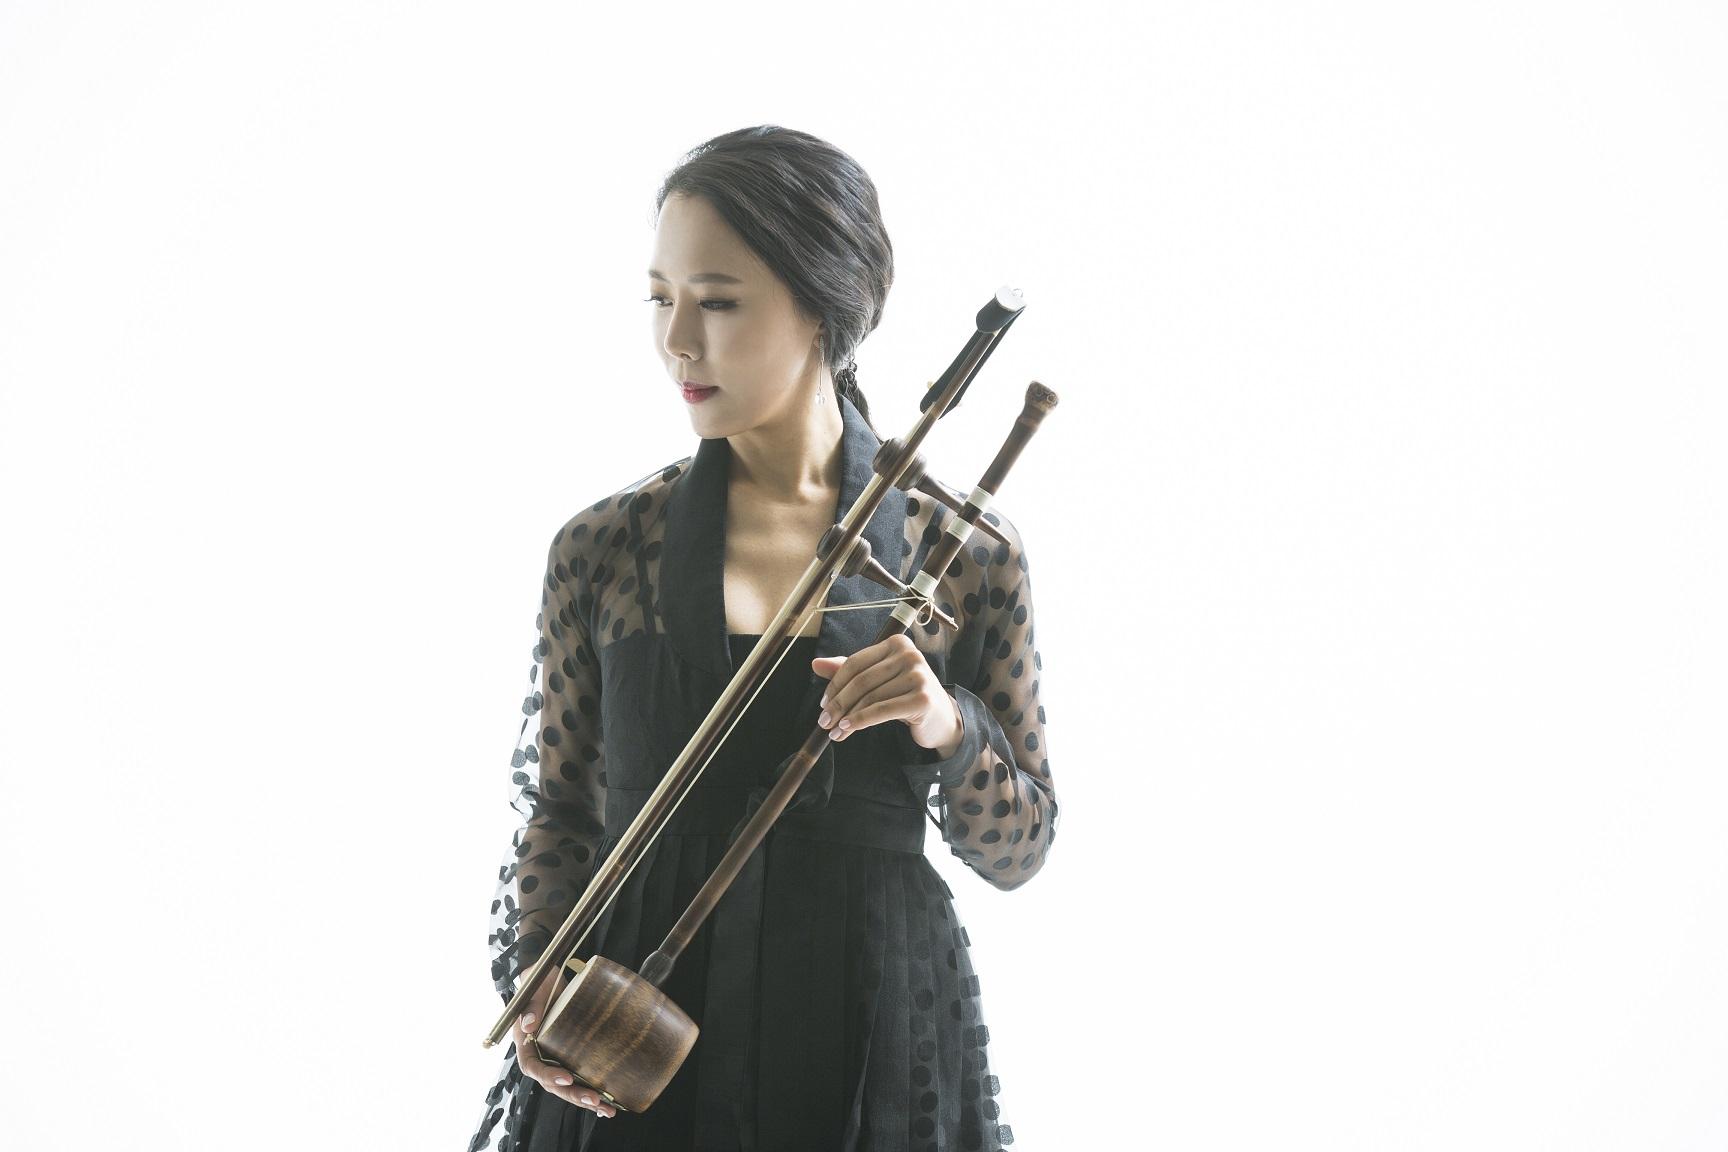 Soo Yeon Lyuh (c) Seung Yull Nah (1) small (1).jpg